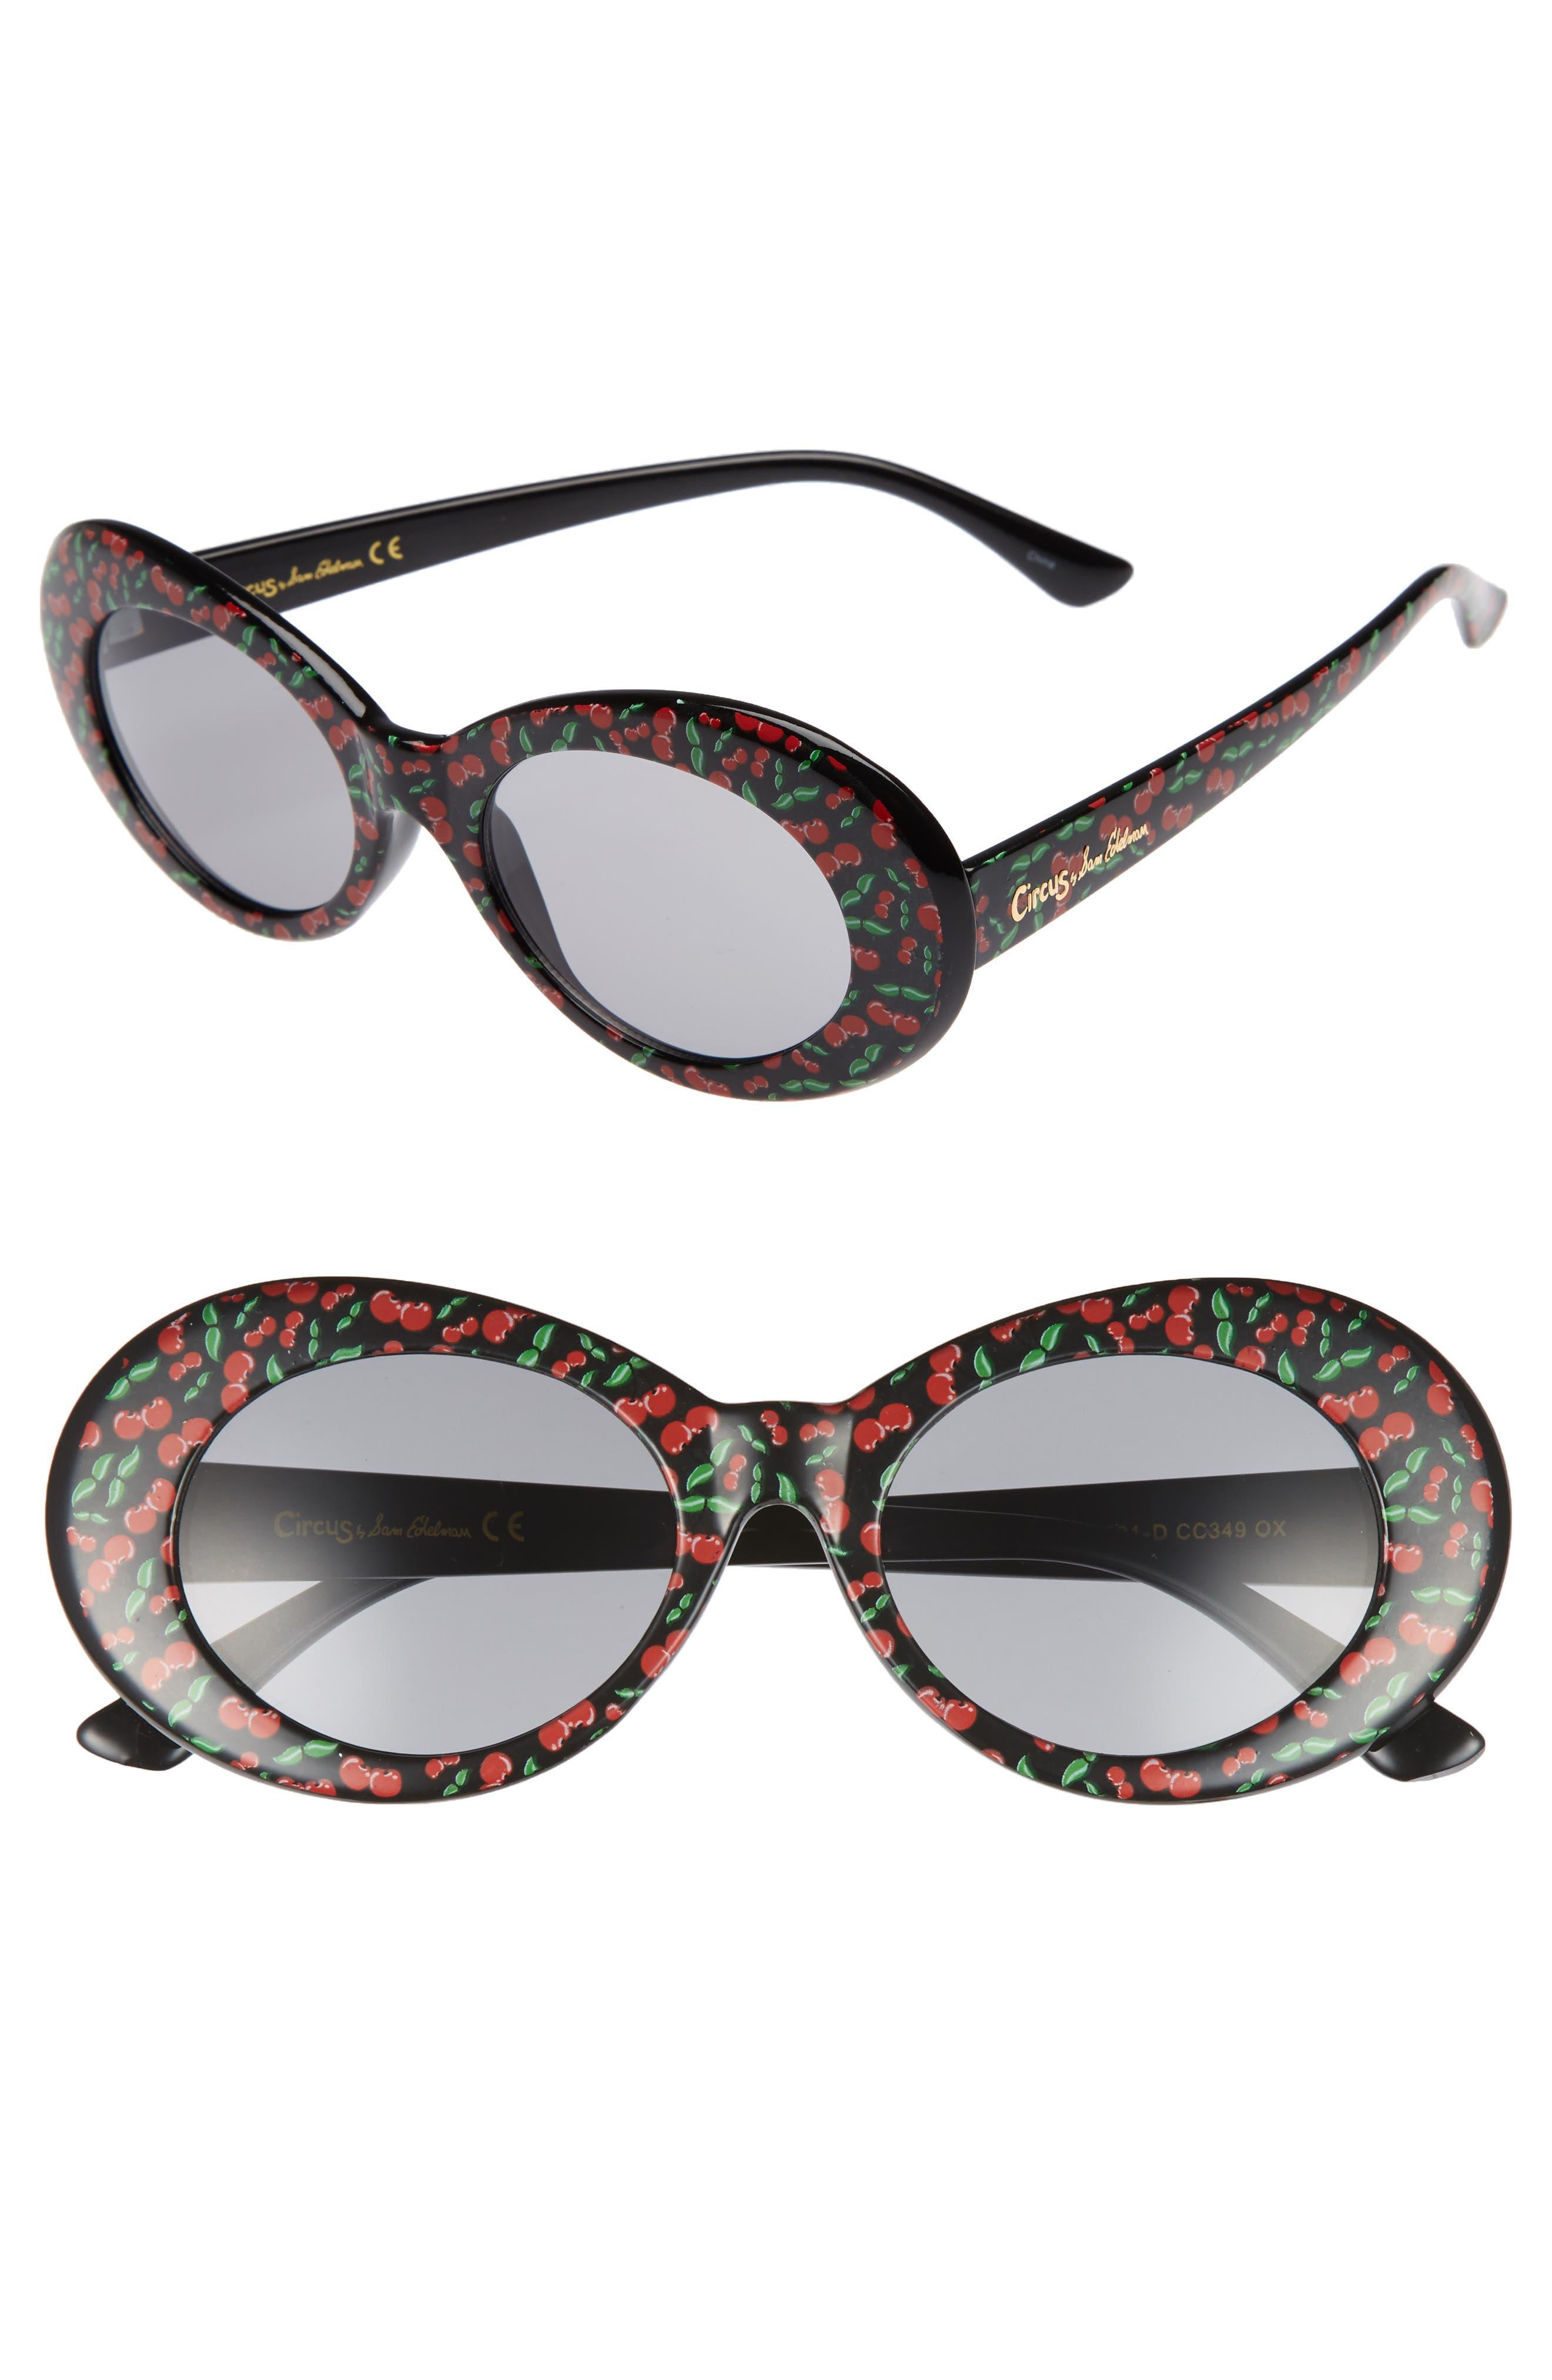 50mm Cherry Print Oval Sunglasses,                         Main,                         color, Black/ Cherry Print